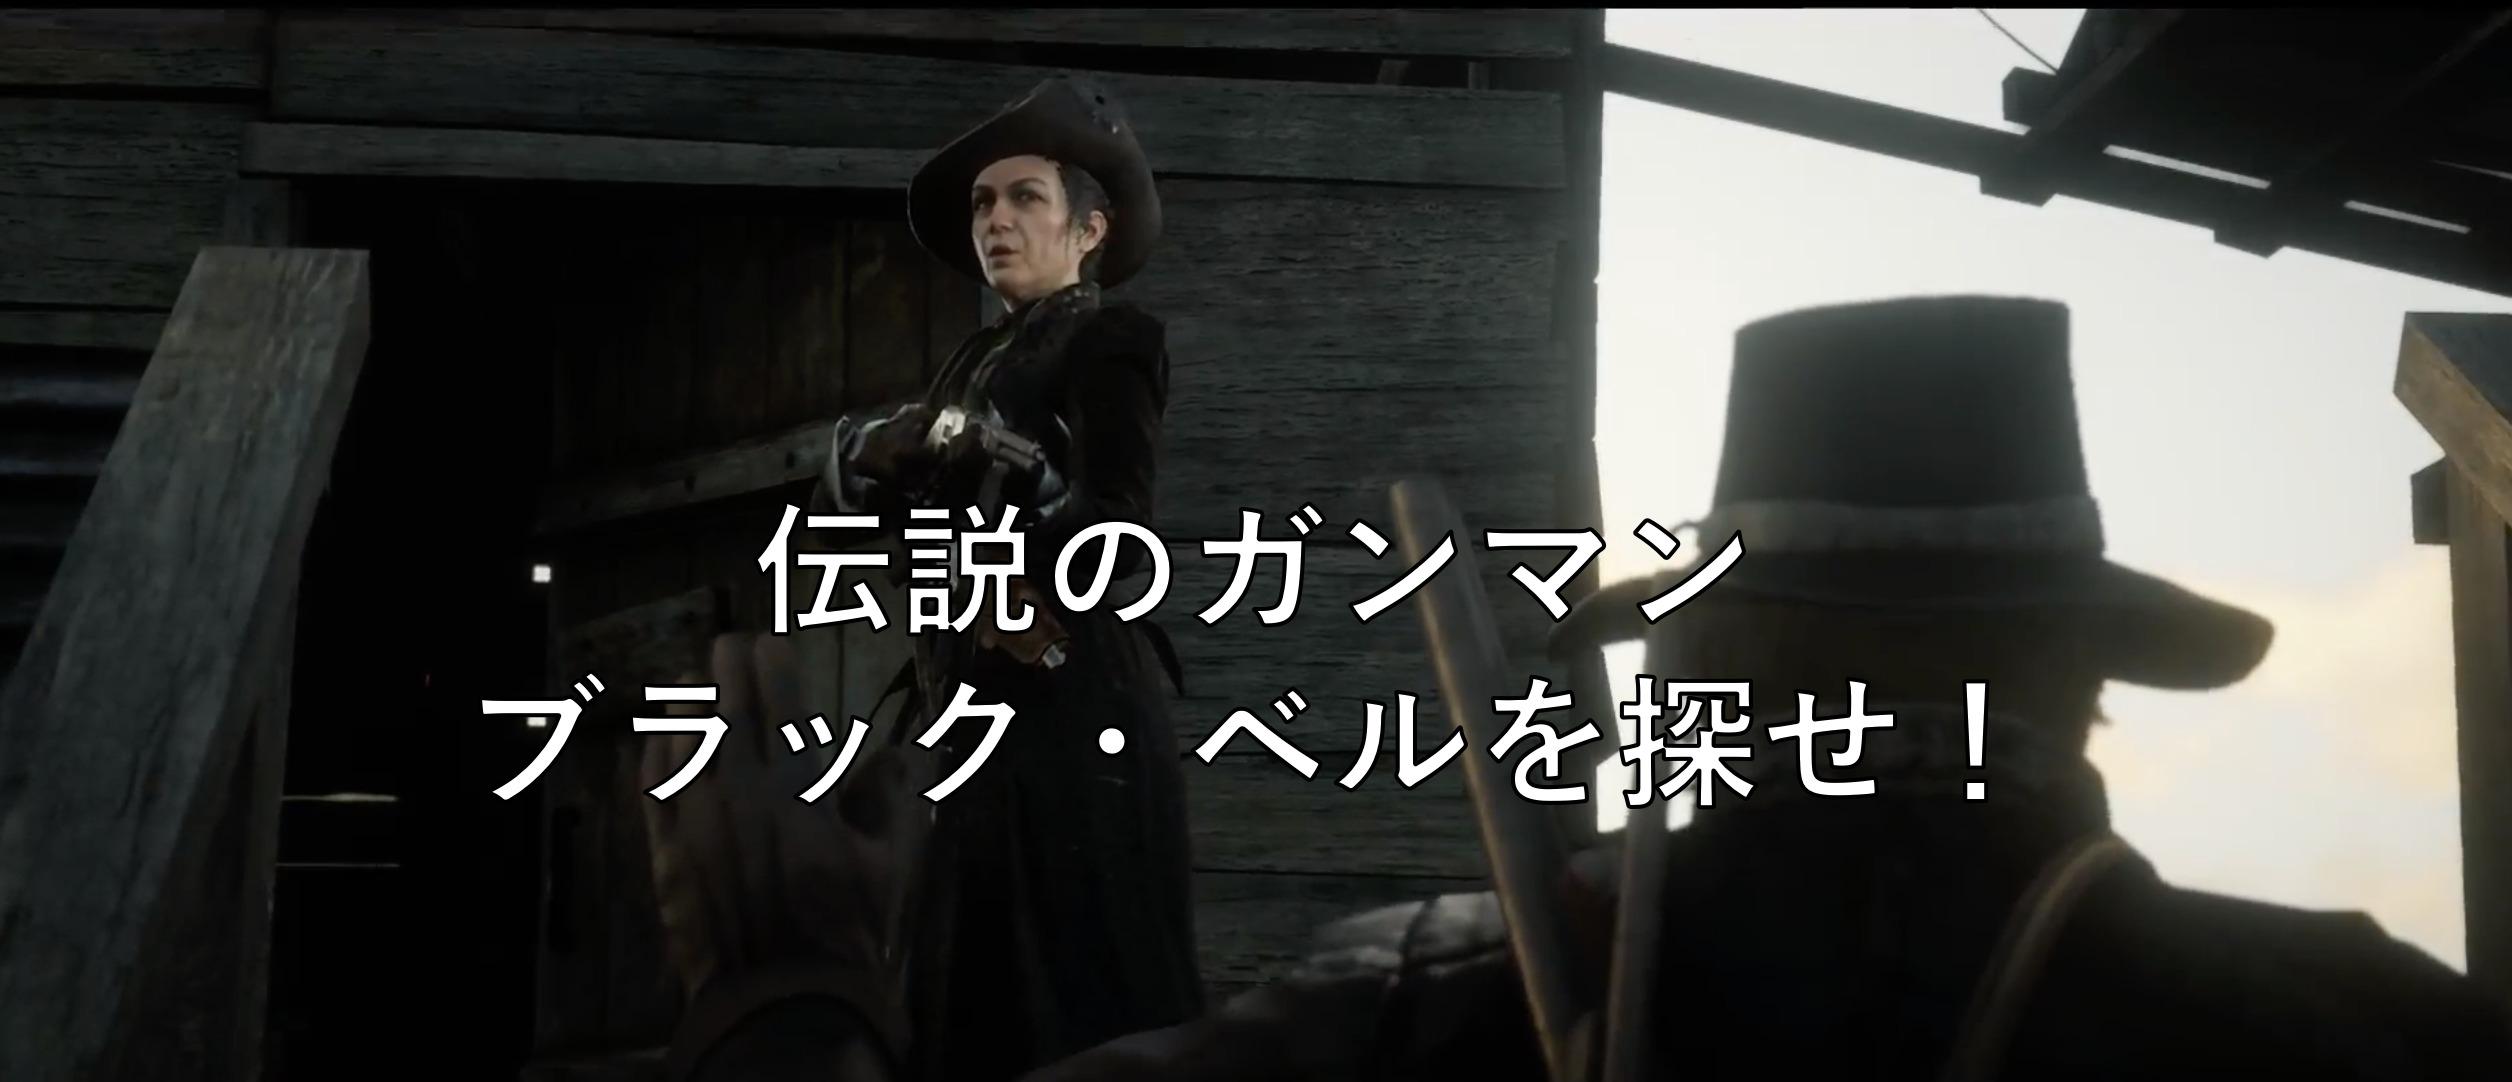 【Red Dead Redemption 2】「伝説のガンマン」ブラック・ベルのミッション攻略